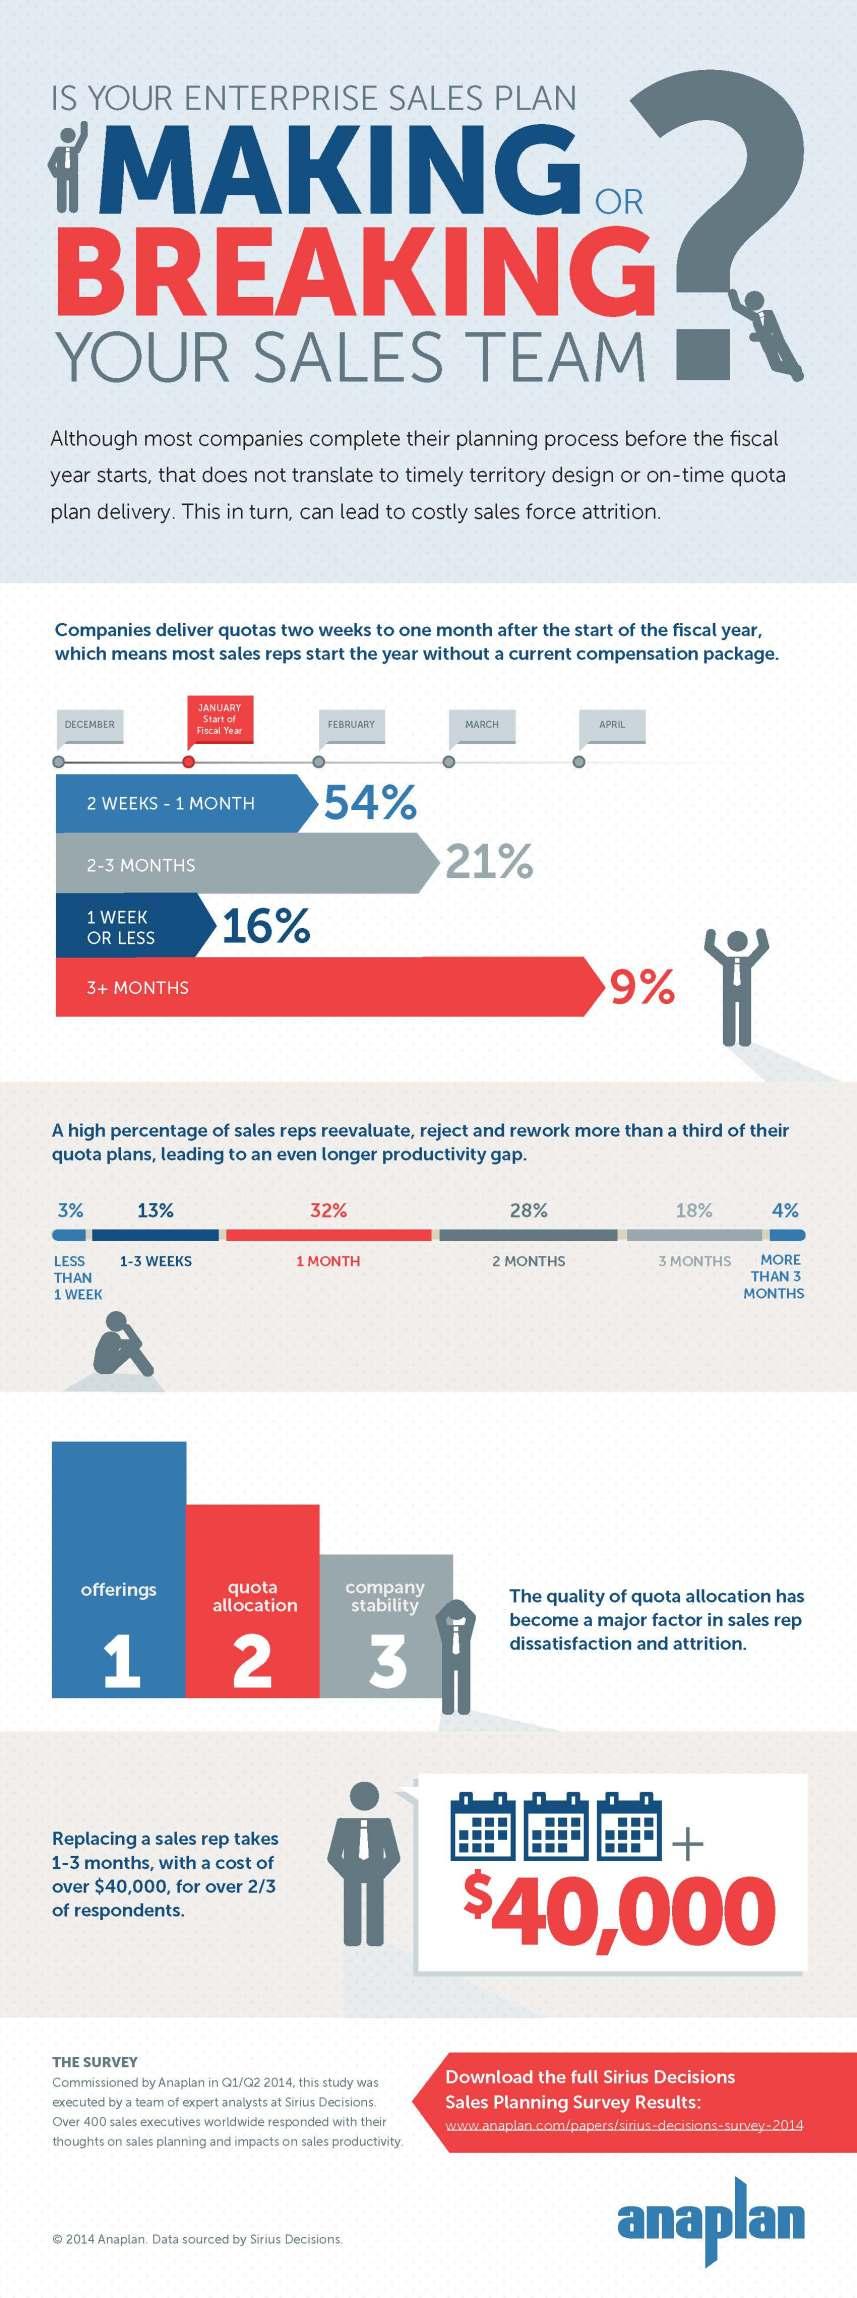 Anaplan_Sirius_Decisions_Survey_2014_Infographic.jpg